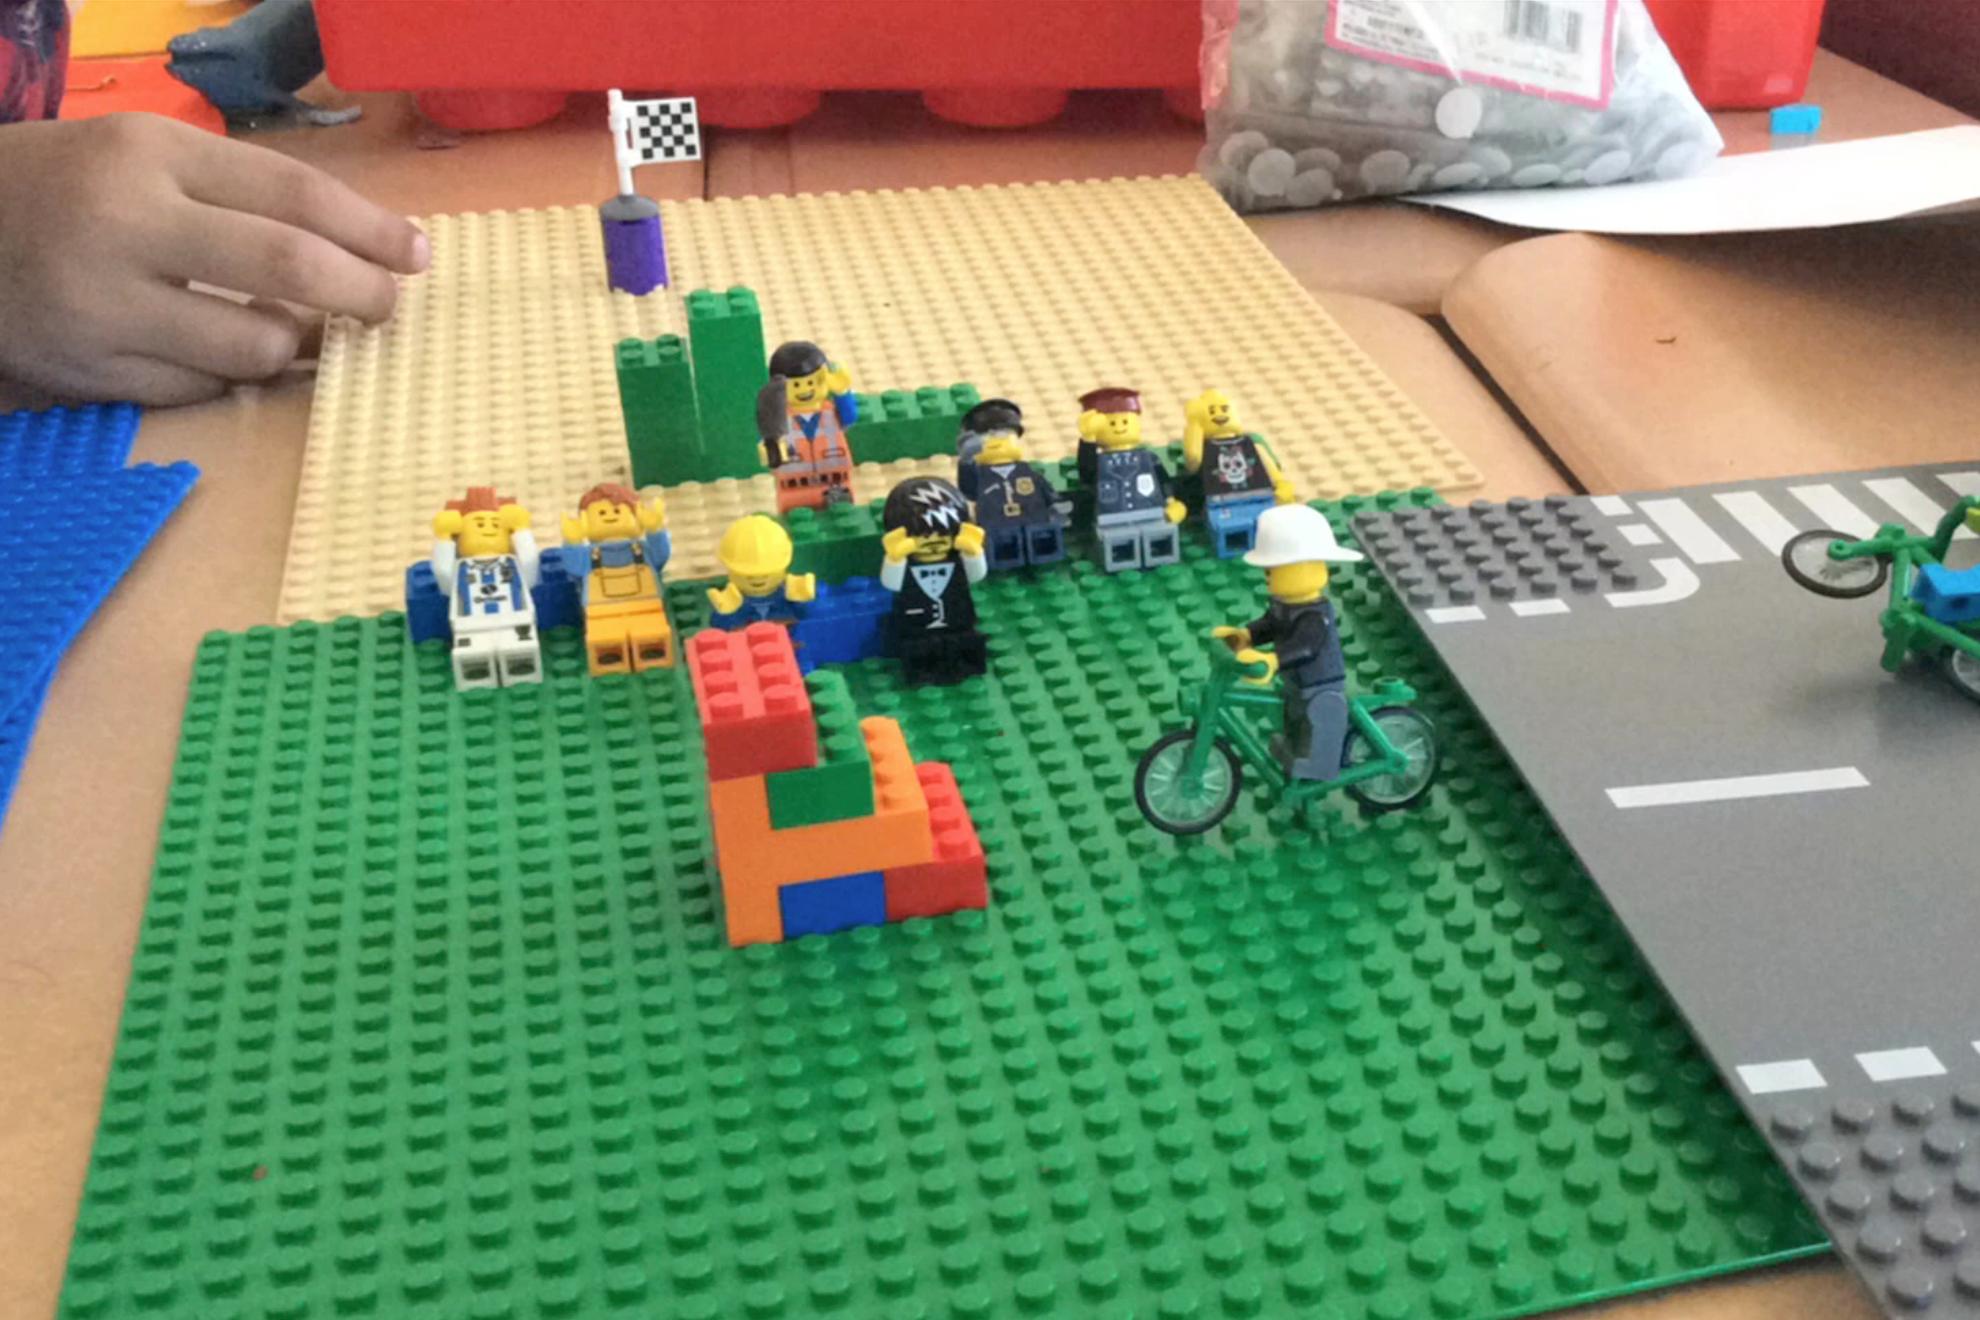 Lego-mation